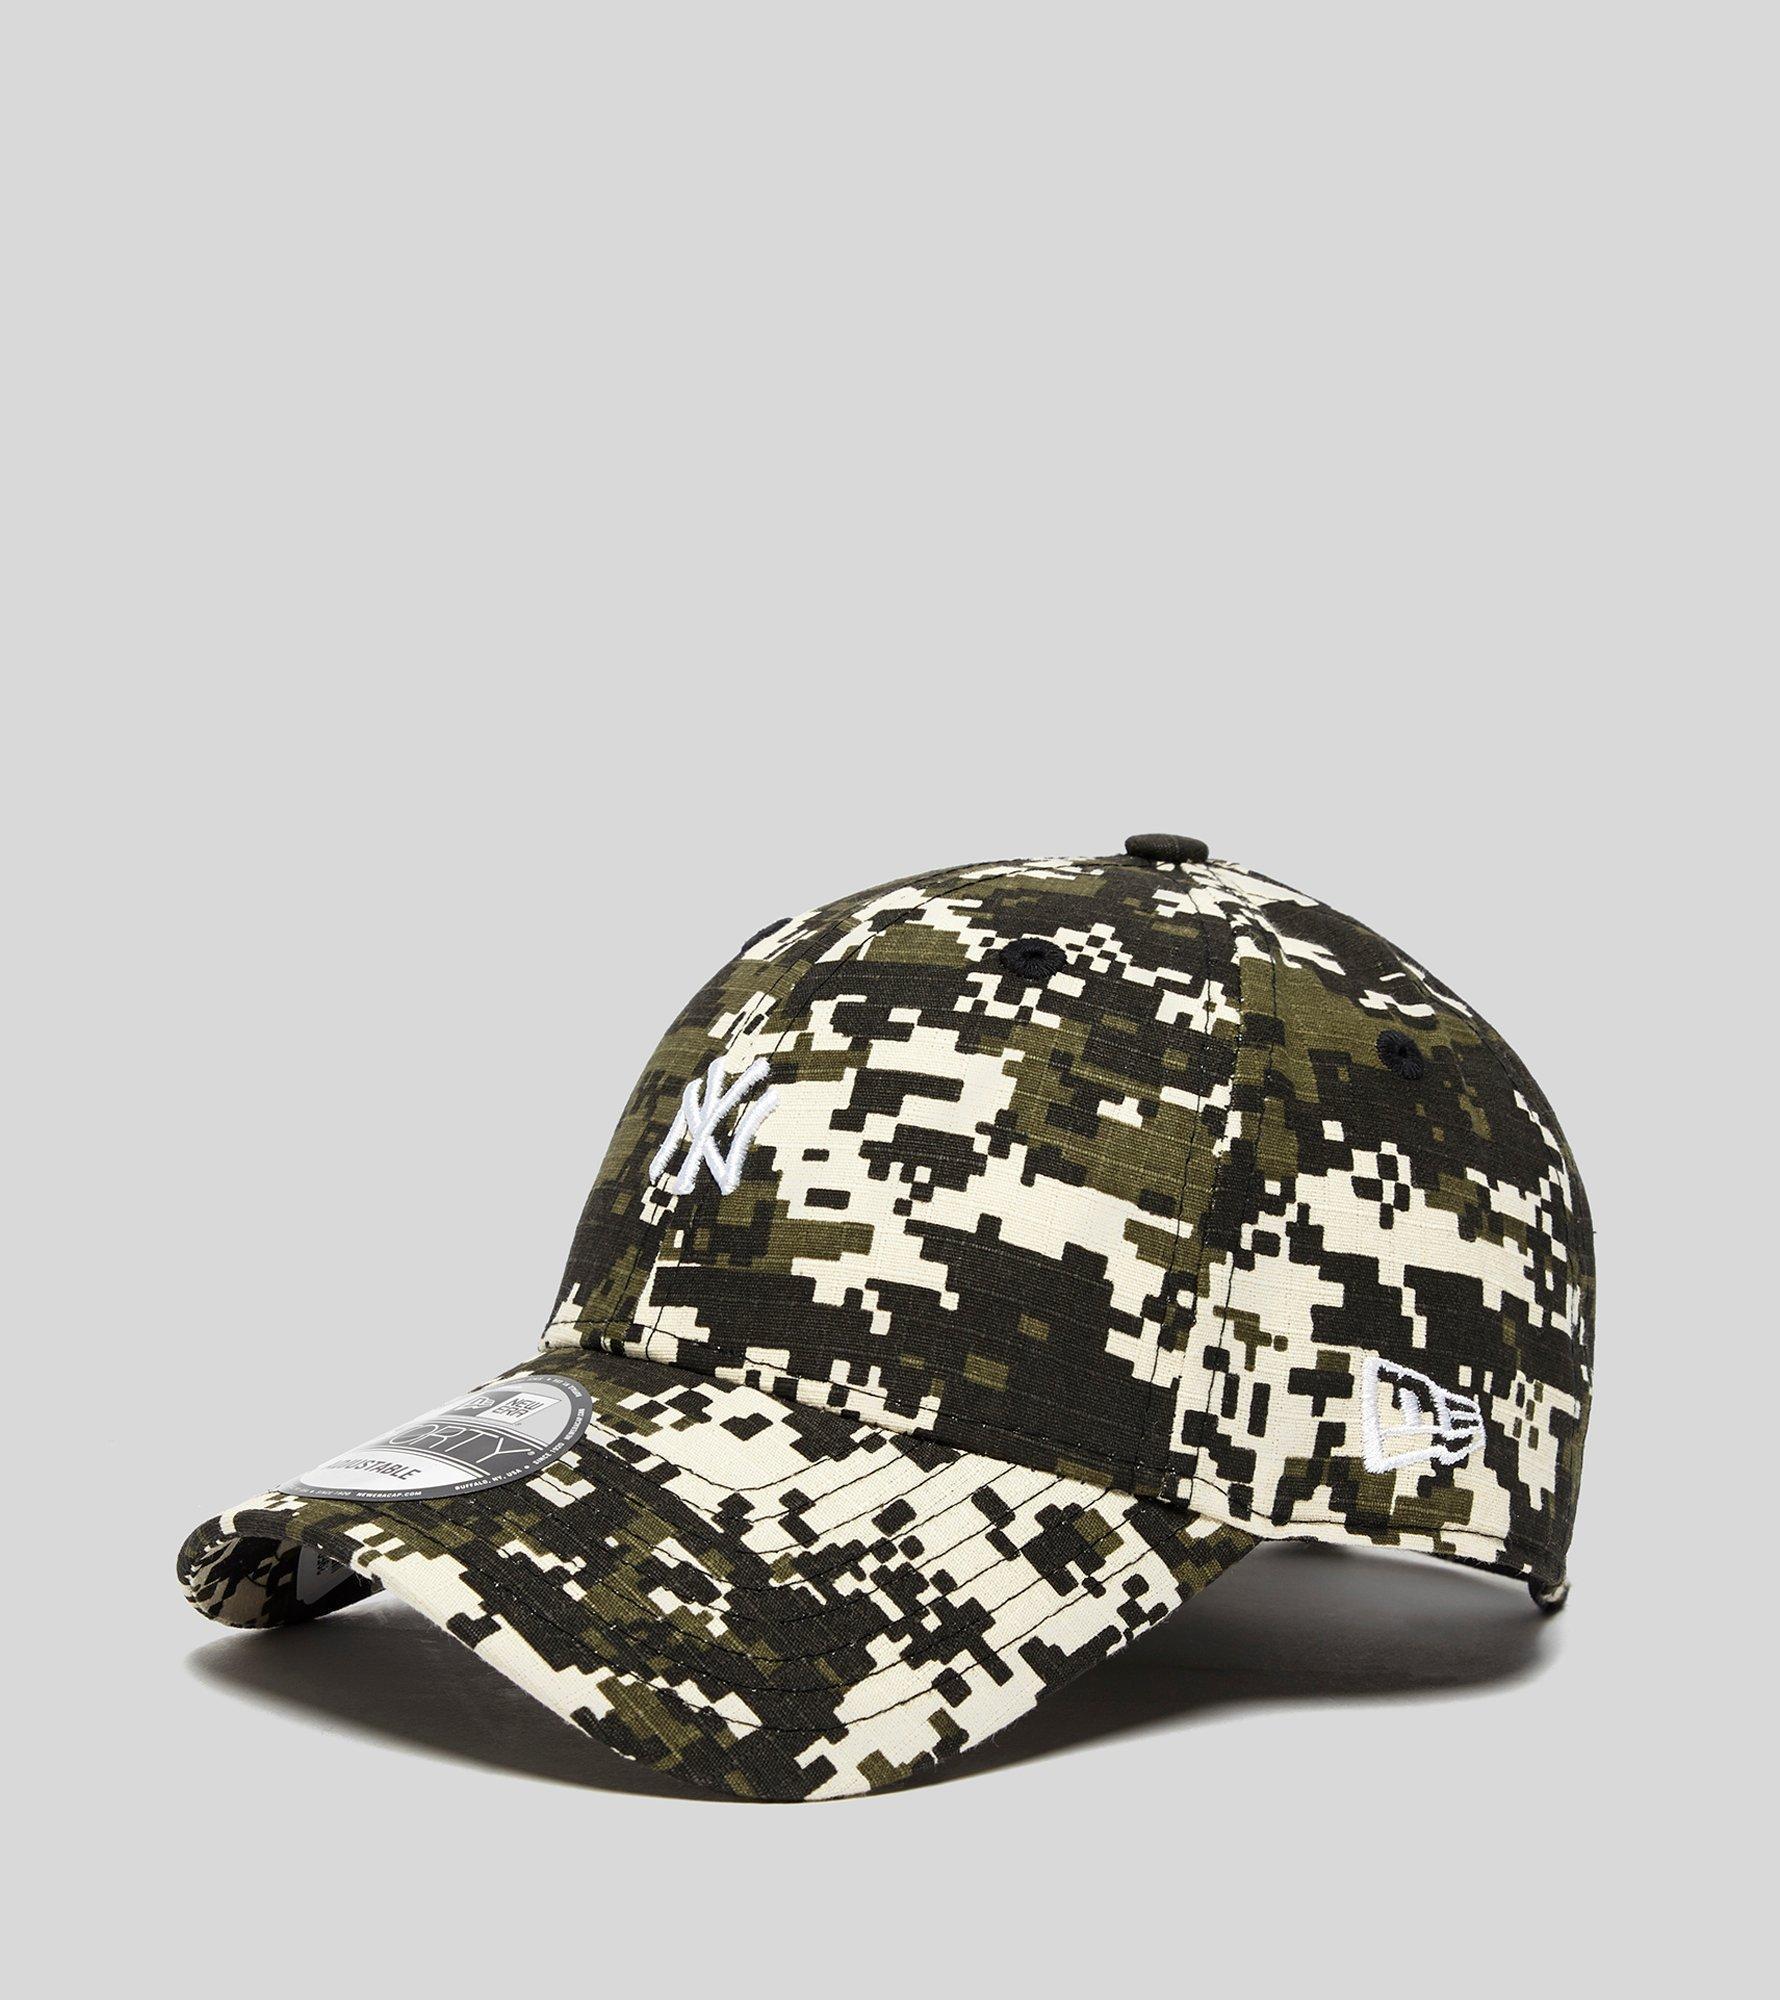 ireland new york yankees bling hat online 7dfb0 bbbec 6edb391c47f1